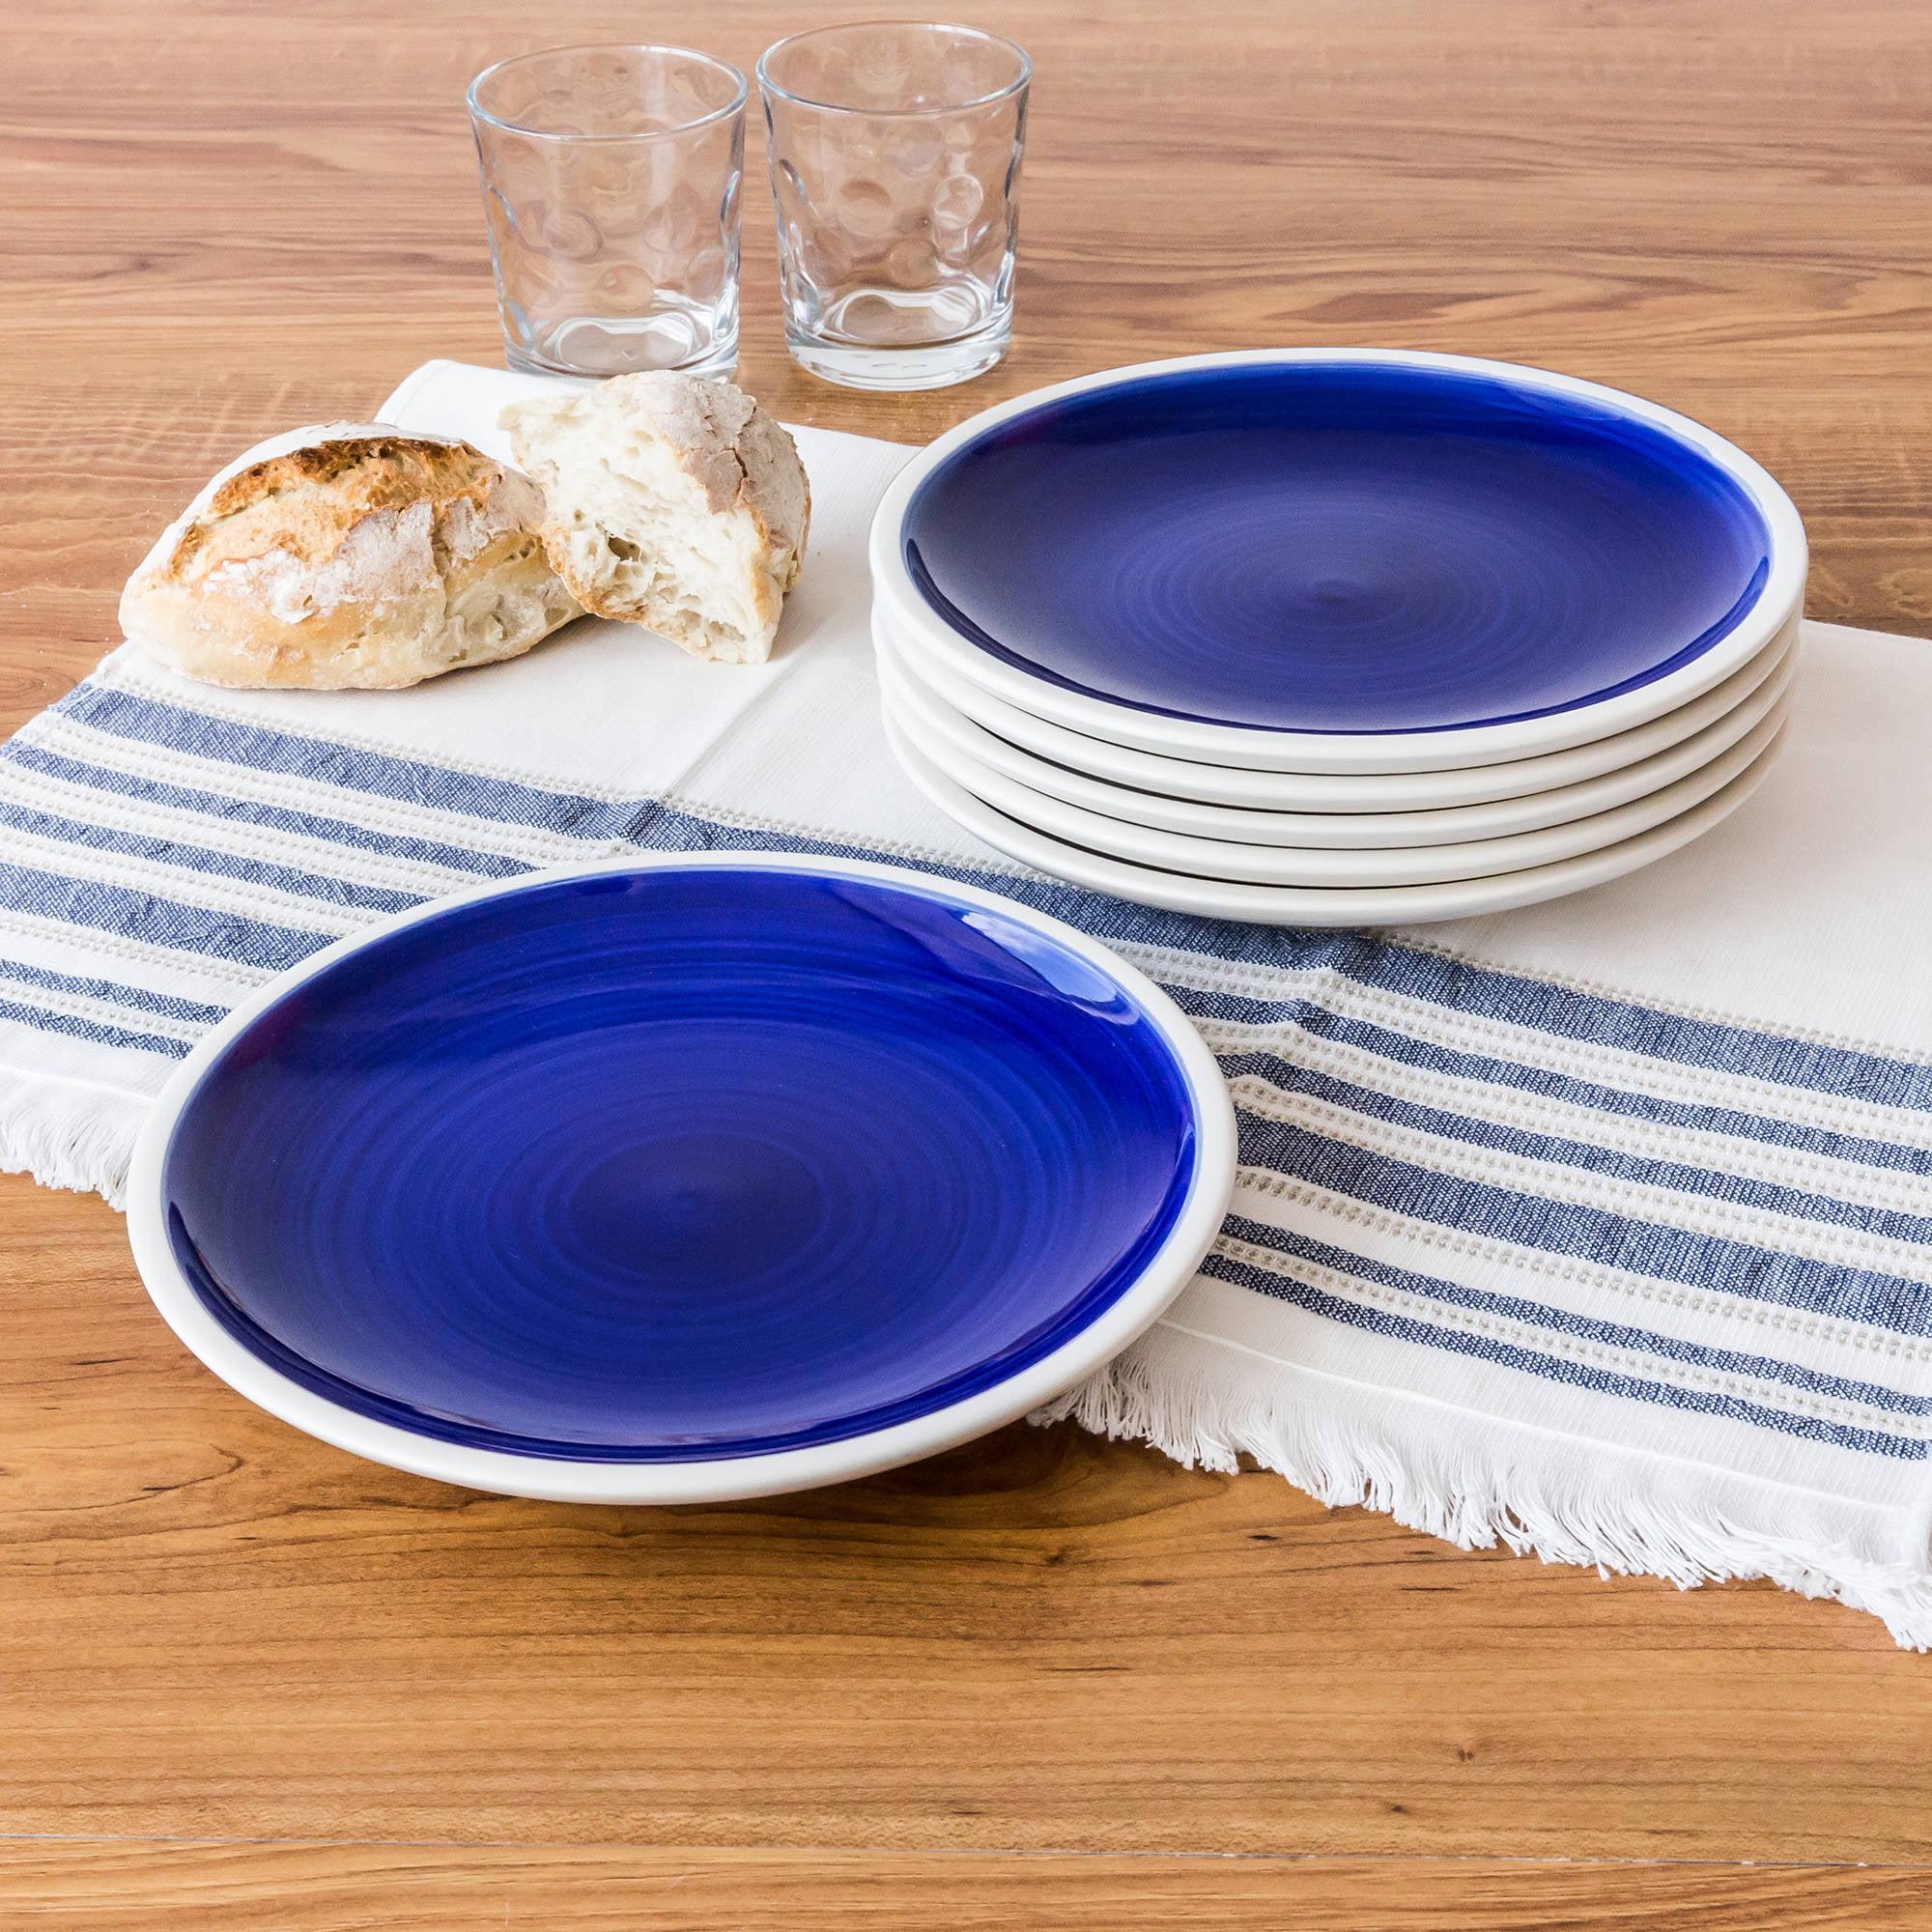 Better Homes and Gardens Indigo Swirl Salad Plates, Blue, Set of 6